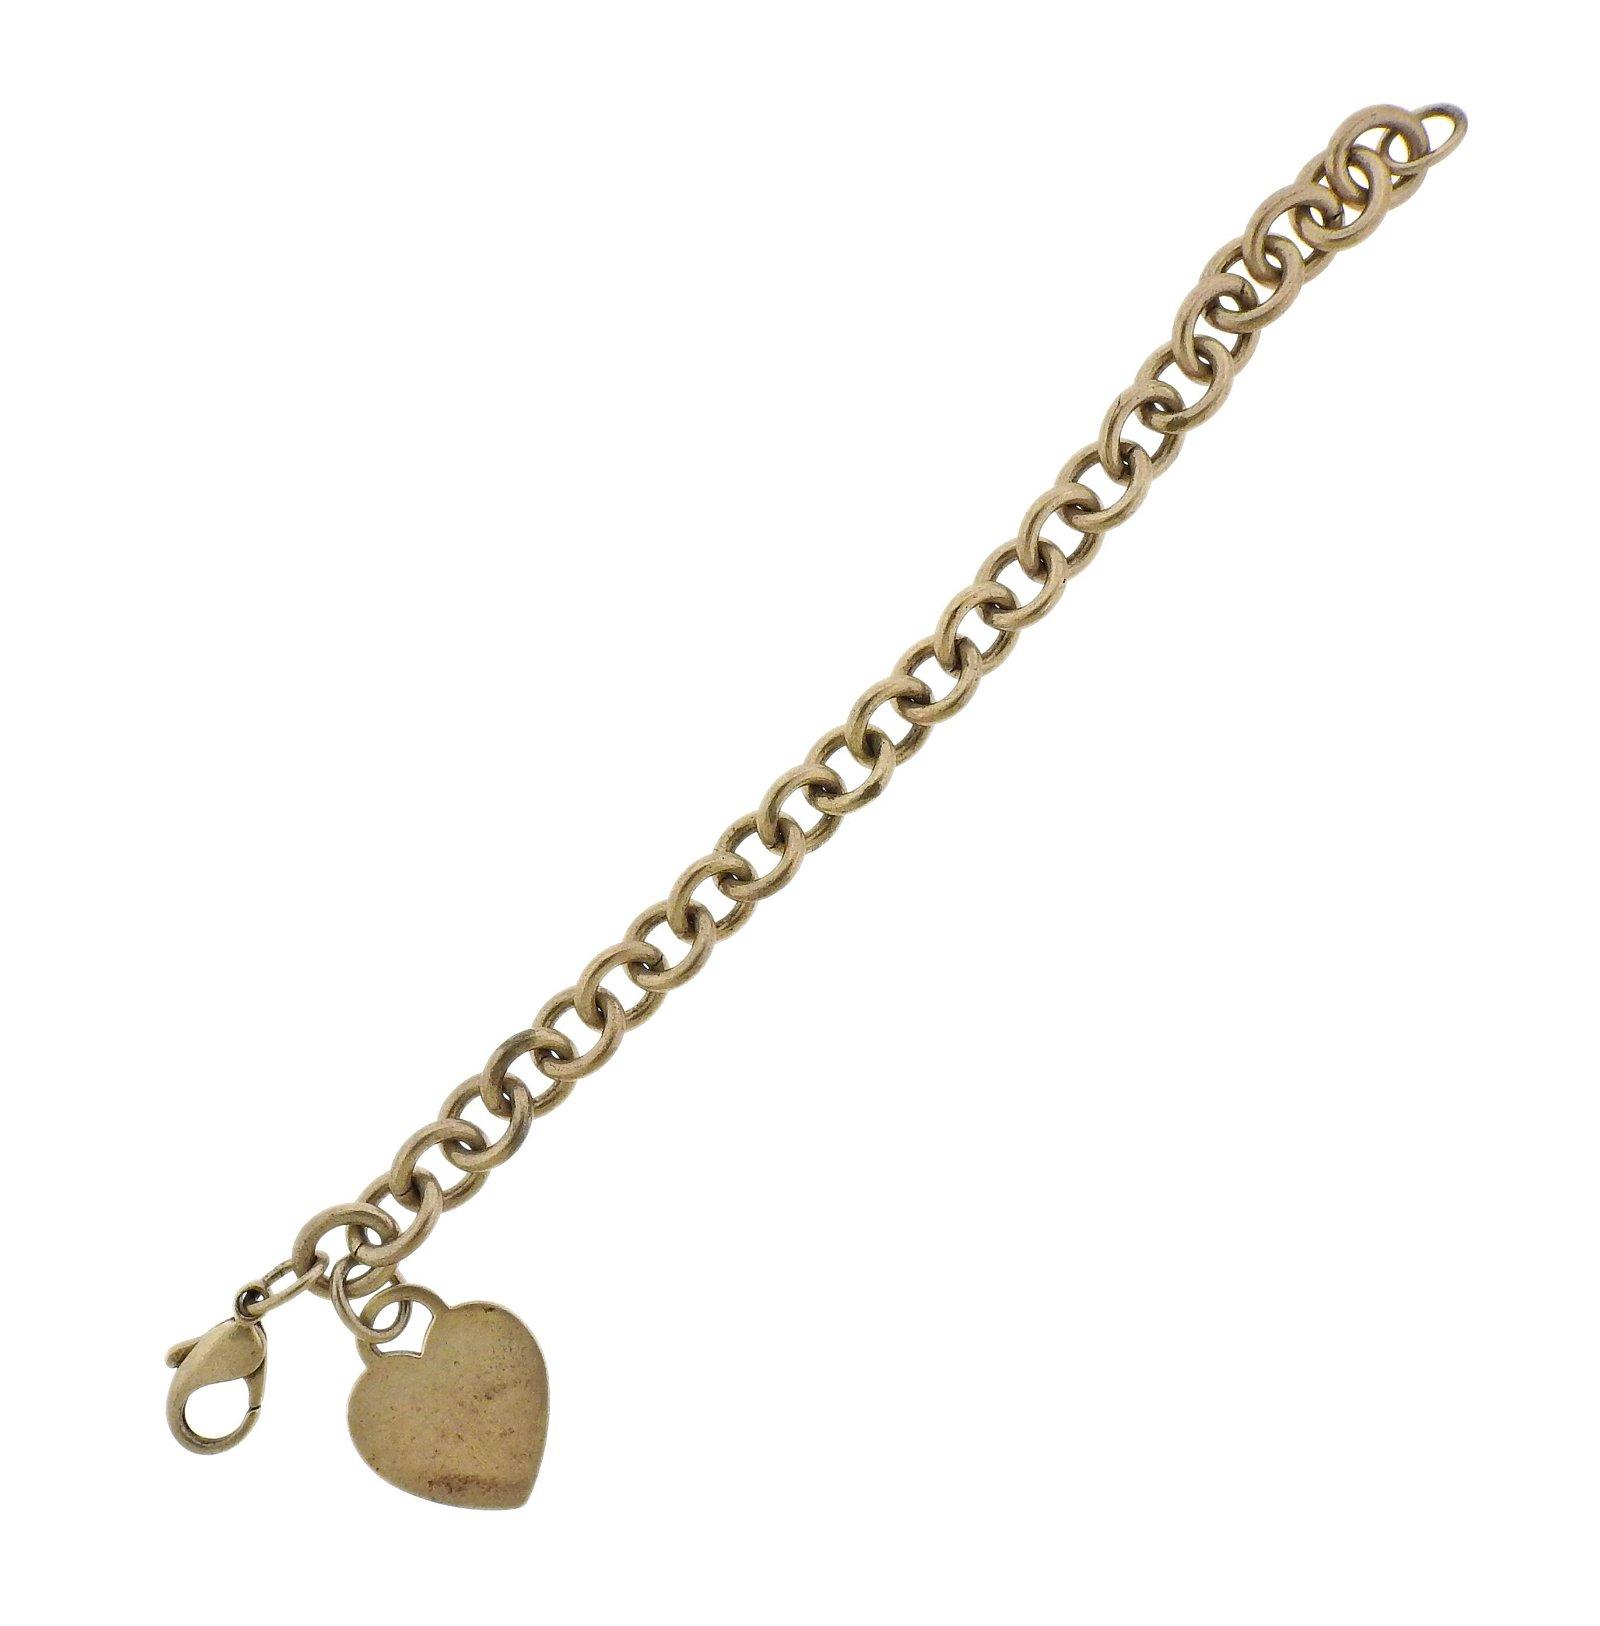 Tiffany & Co Sterling Silver Heart Tag Bracelet